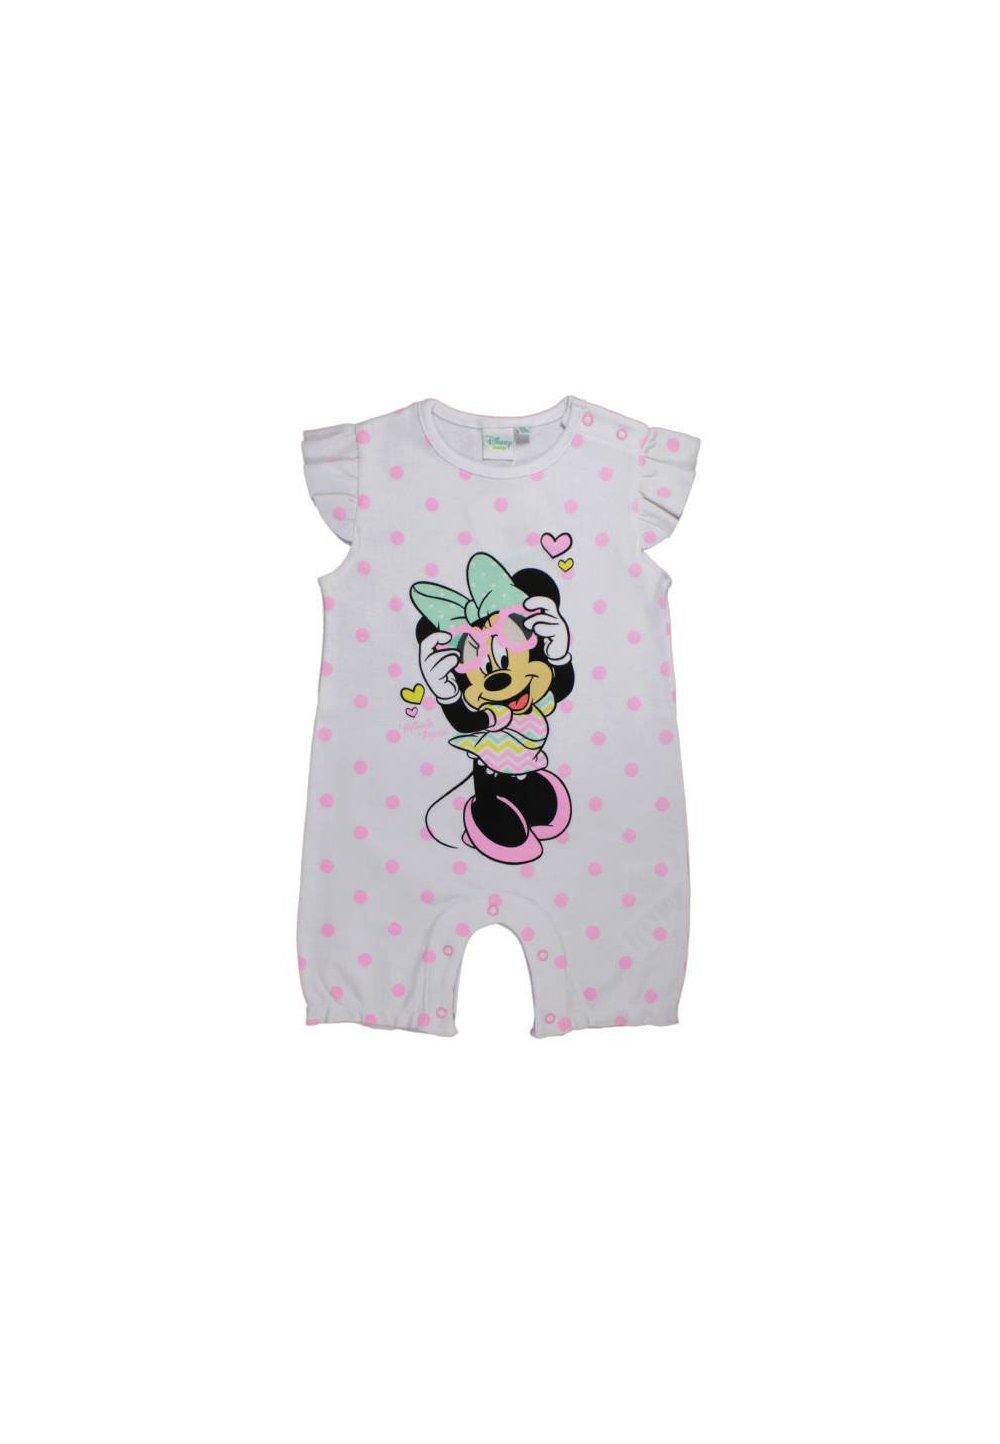 Salopeta vara, Minnie Mouse, alba cu buline roz imagine